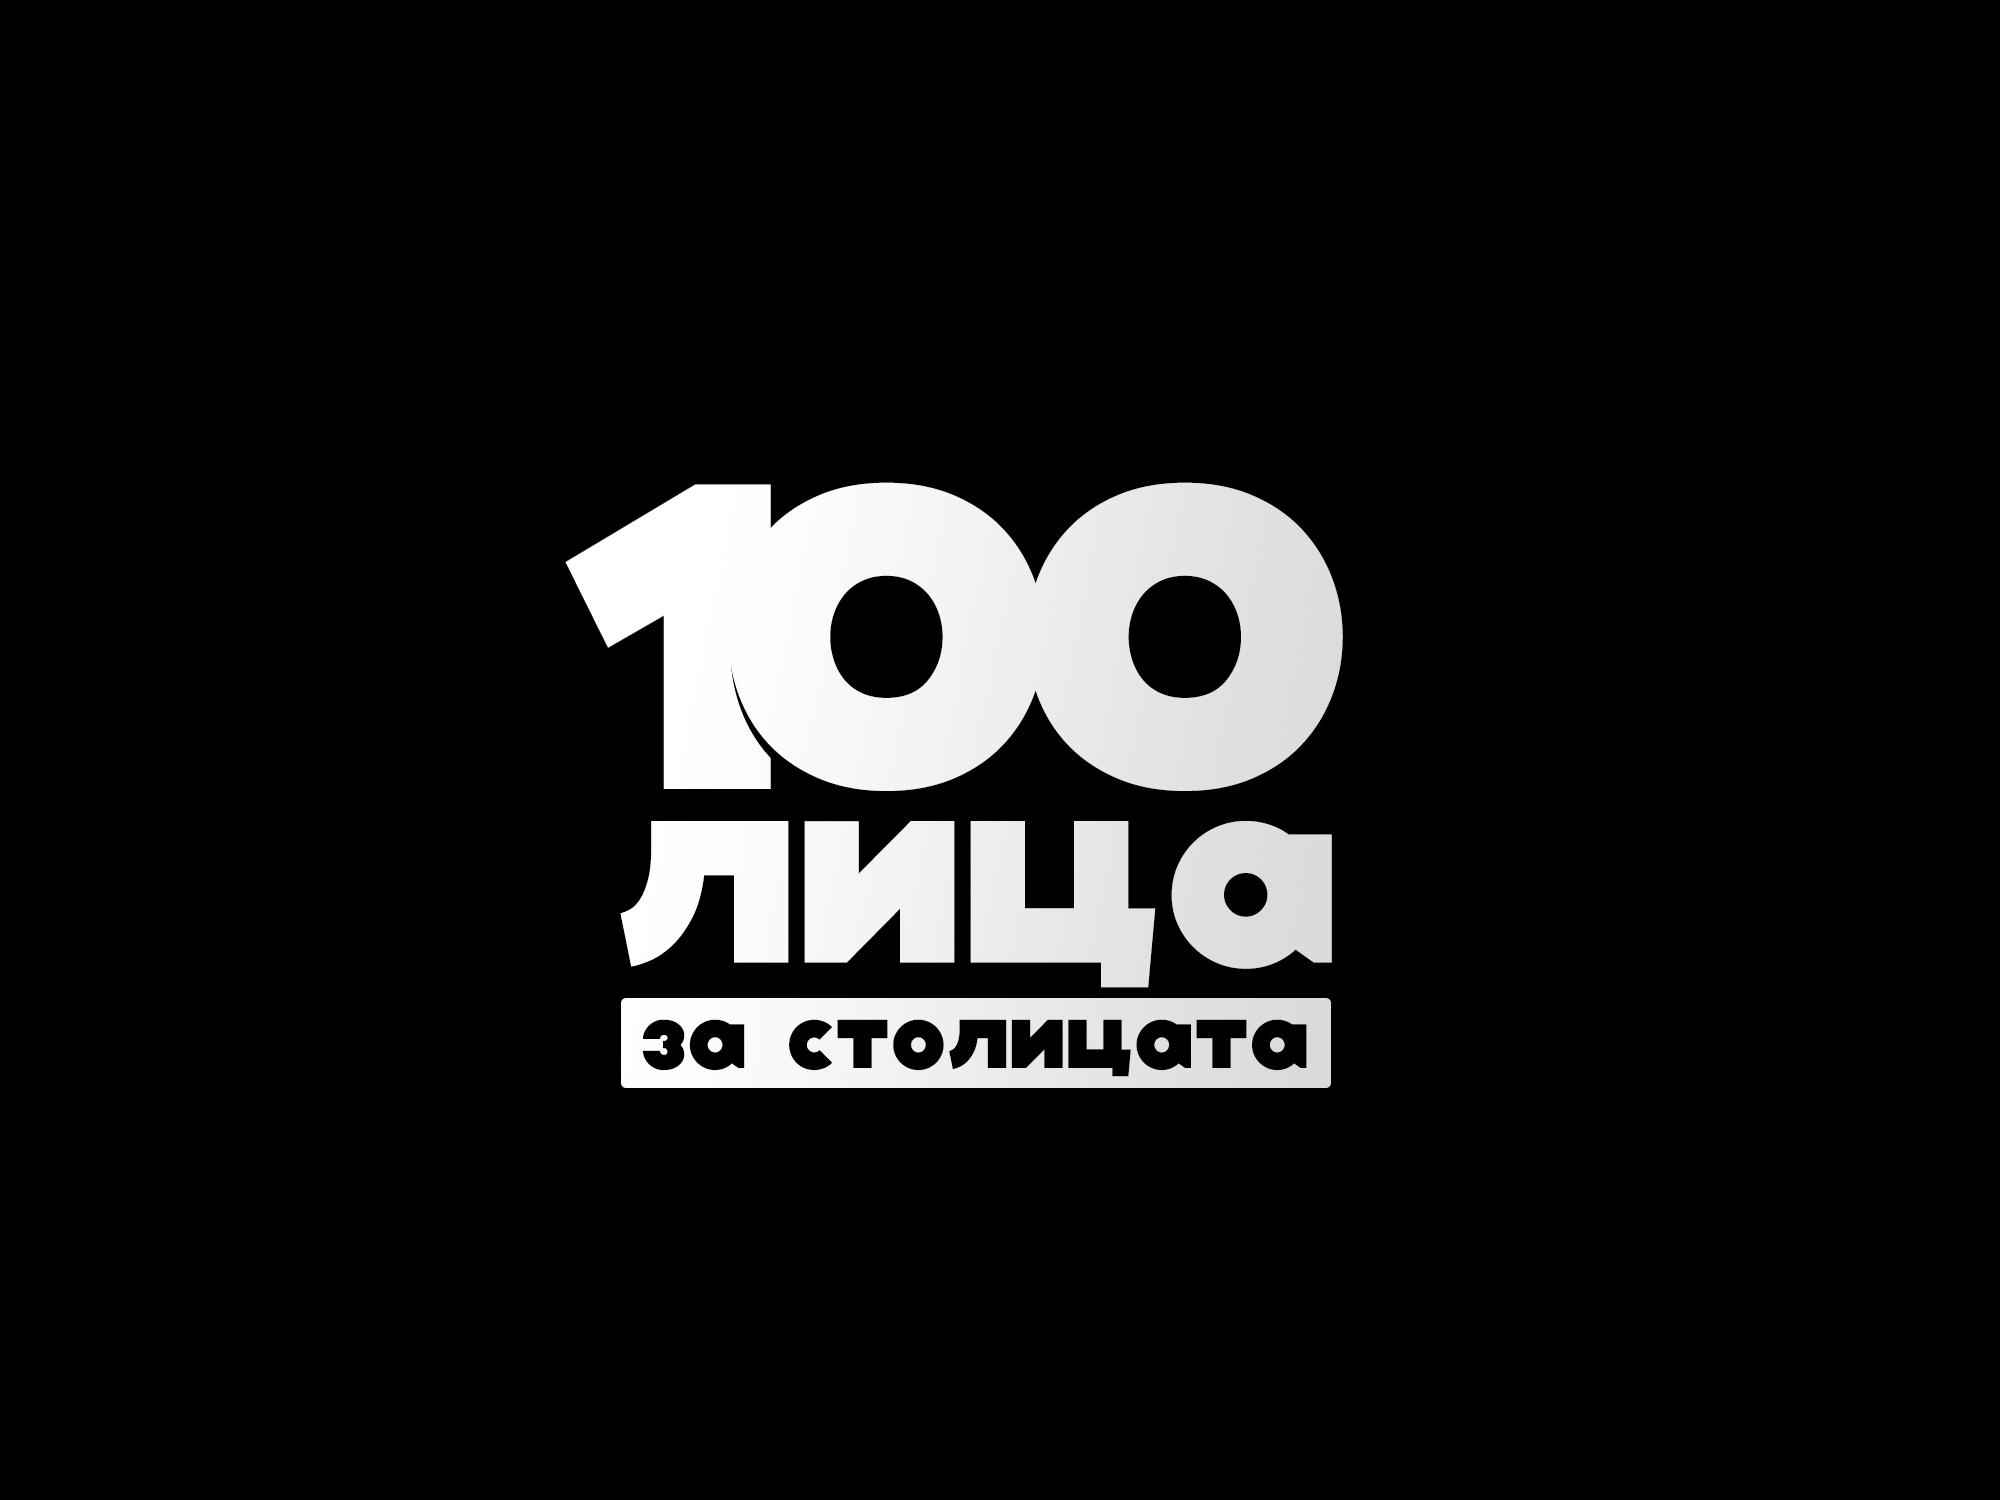 1000_lica_white.png